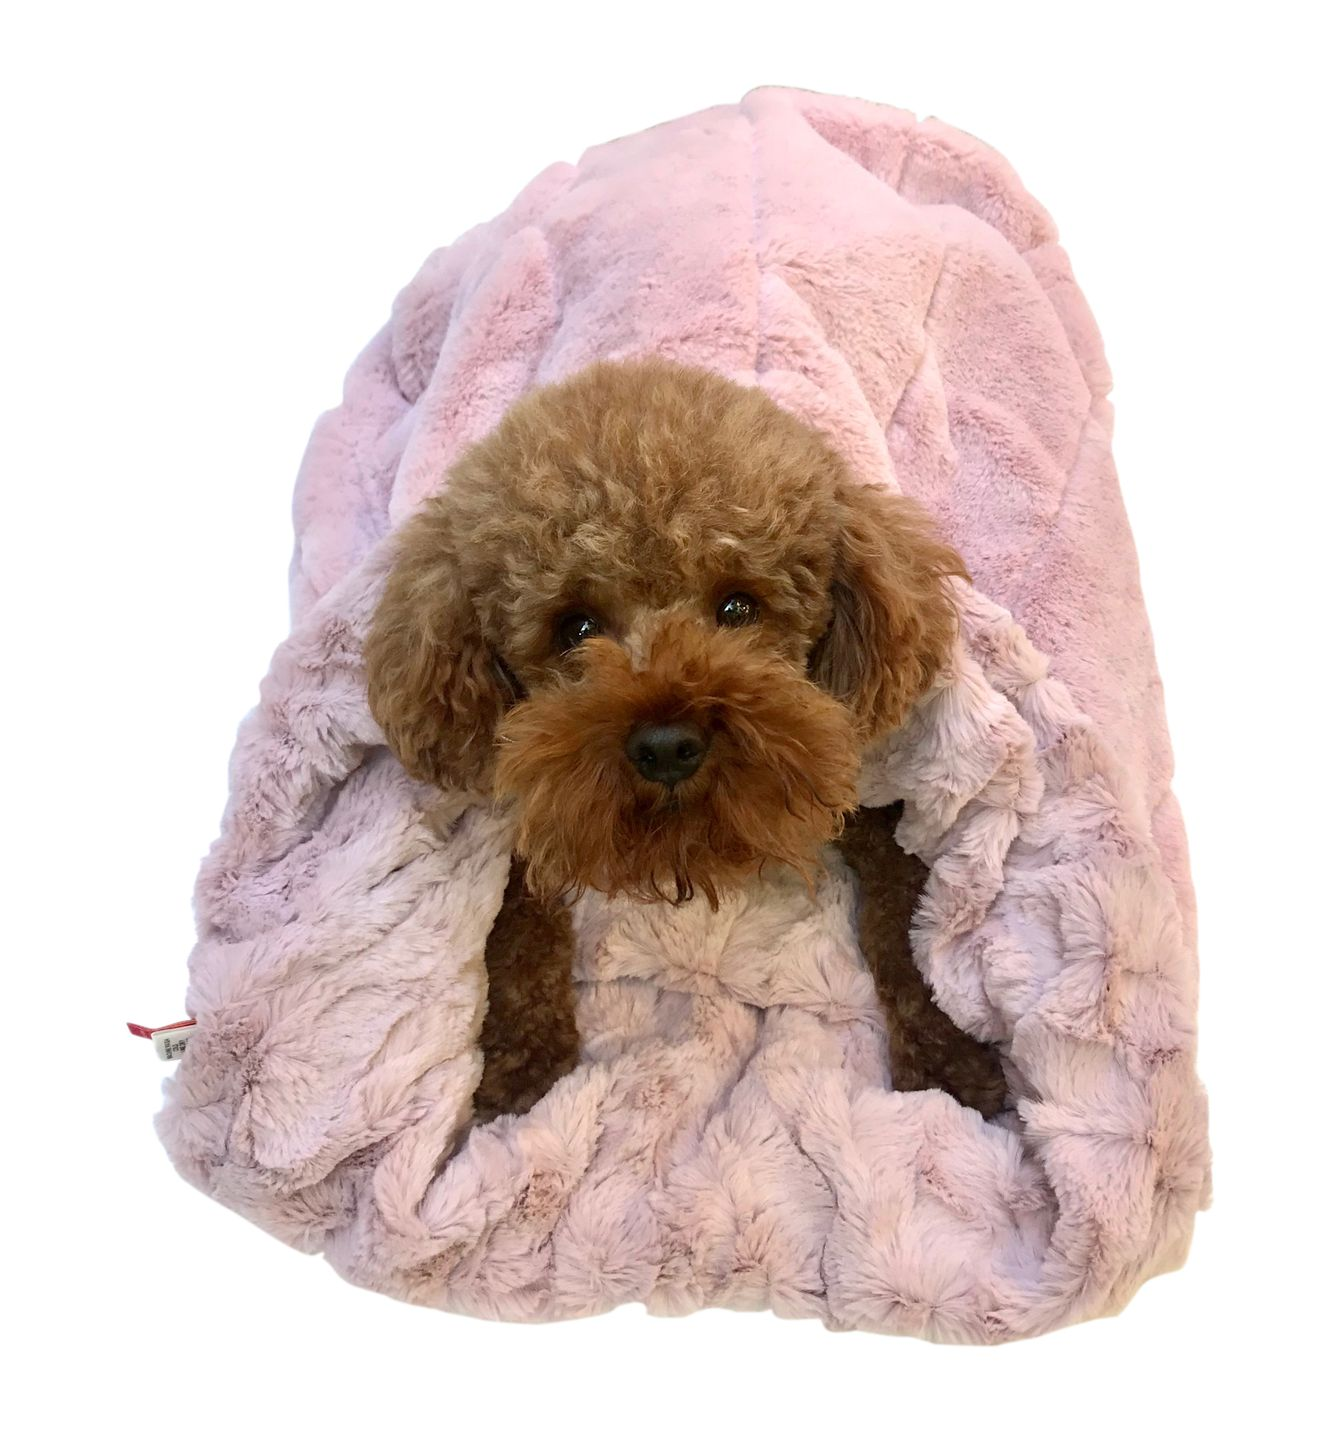 The Dog Squad Cozy Sak Plush Dog Bed, Koala & Bella Blush Pink